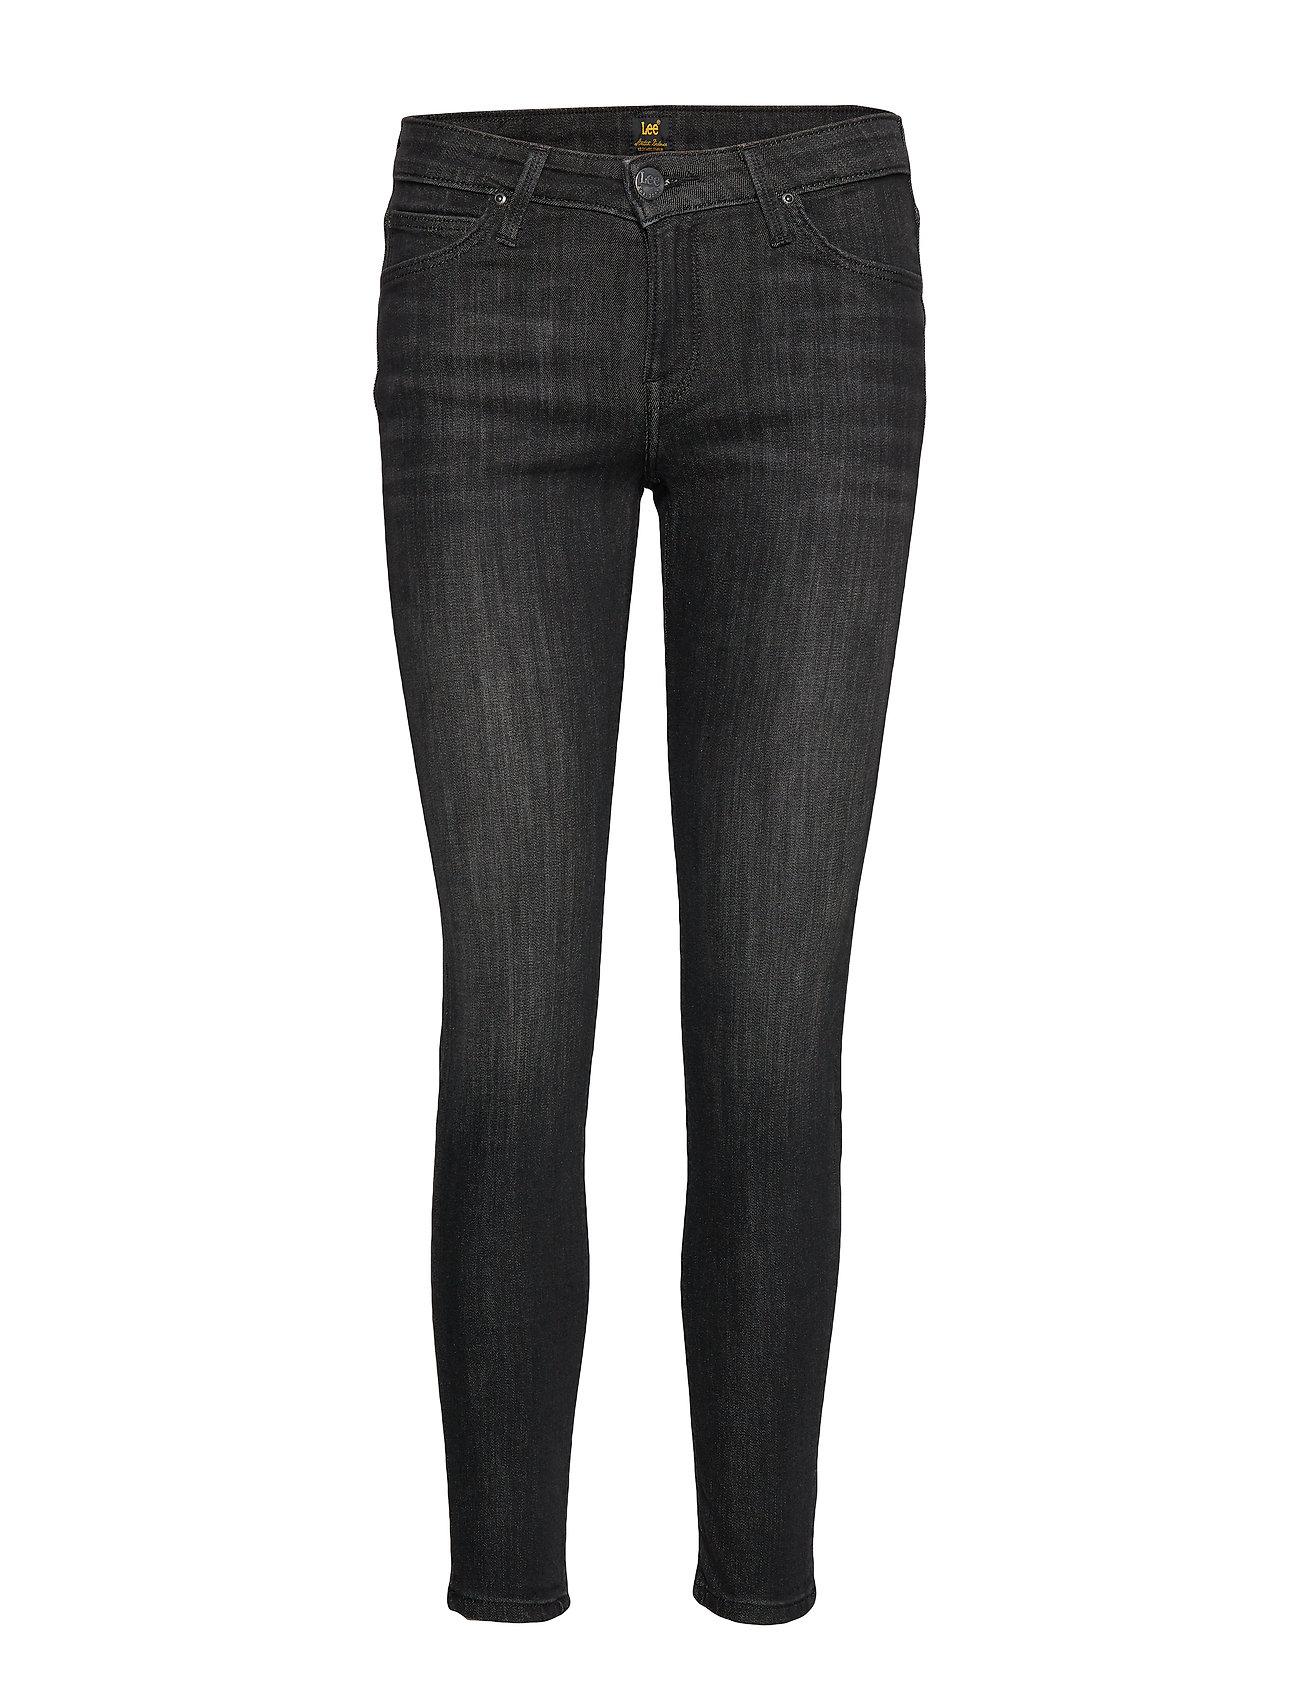 Lee Jeans SCARLETT - BLACK ORRICK